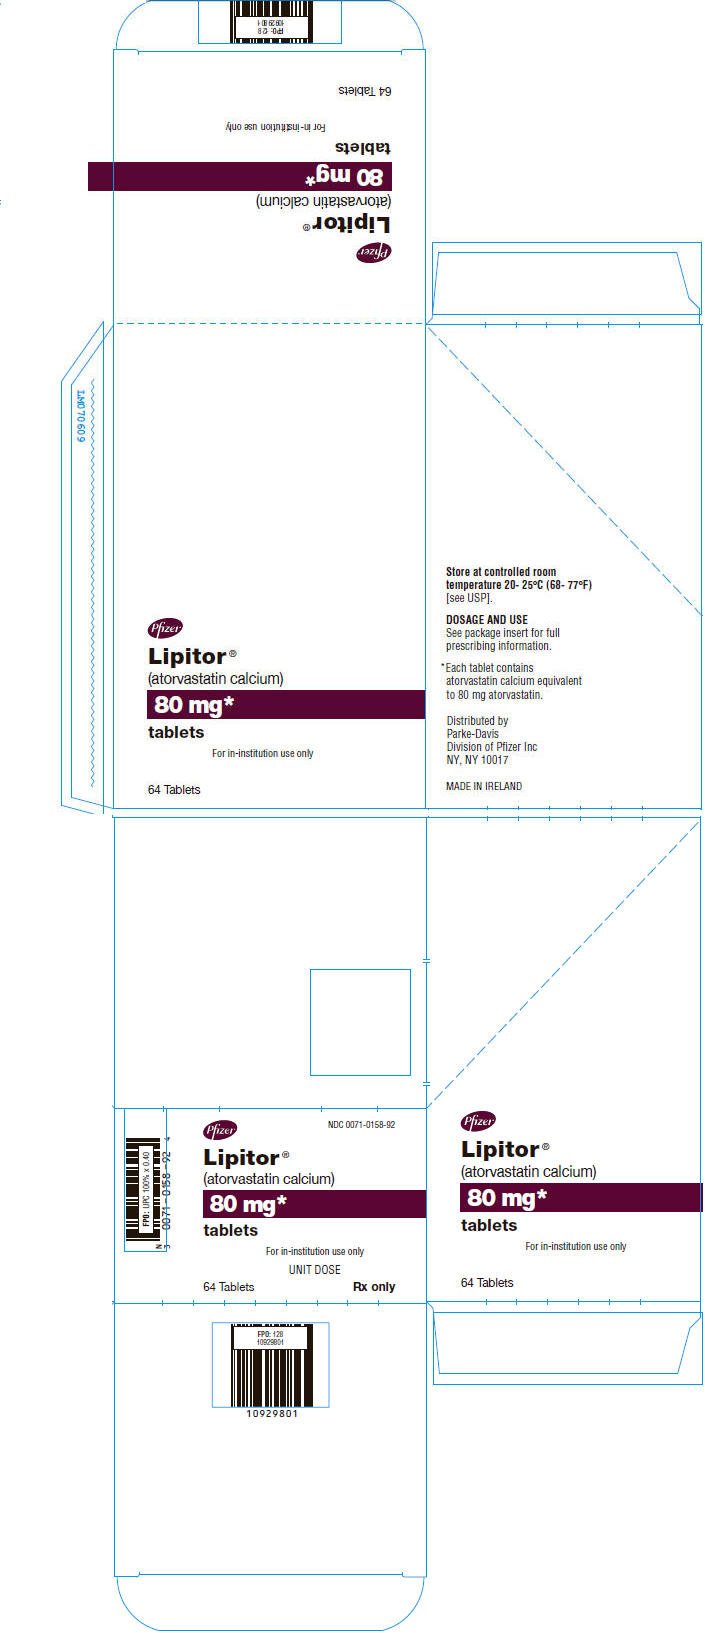 PRINCIPAL DISPLAY PANEL - 80 mg Tablet Blister Pack Carton